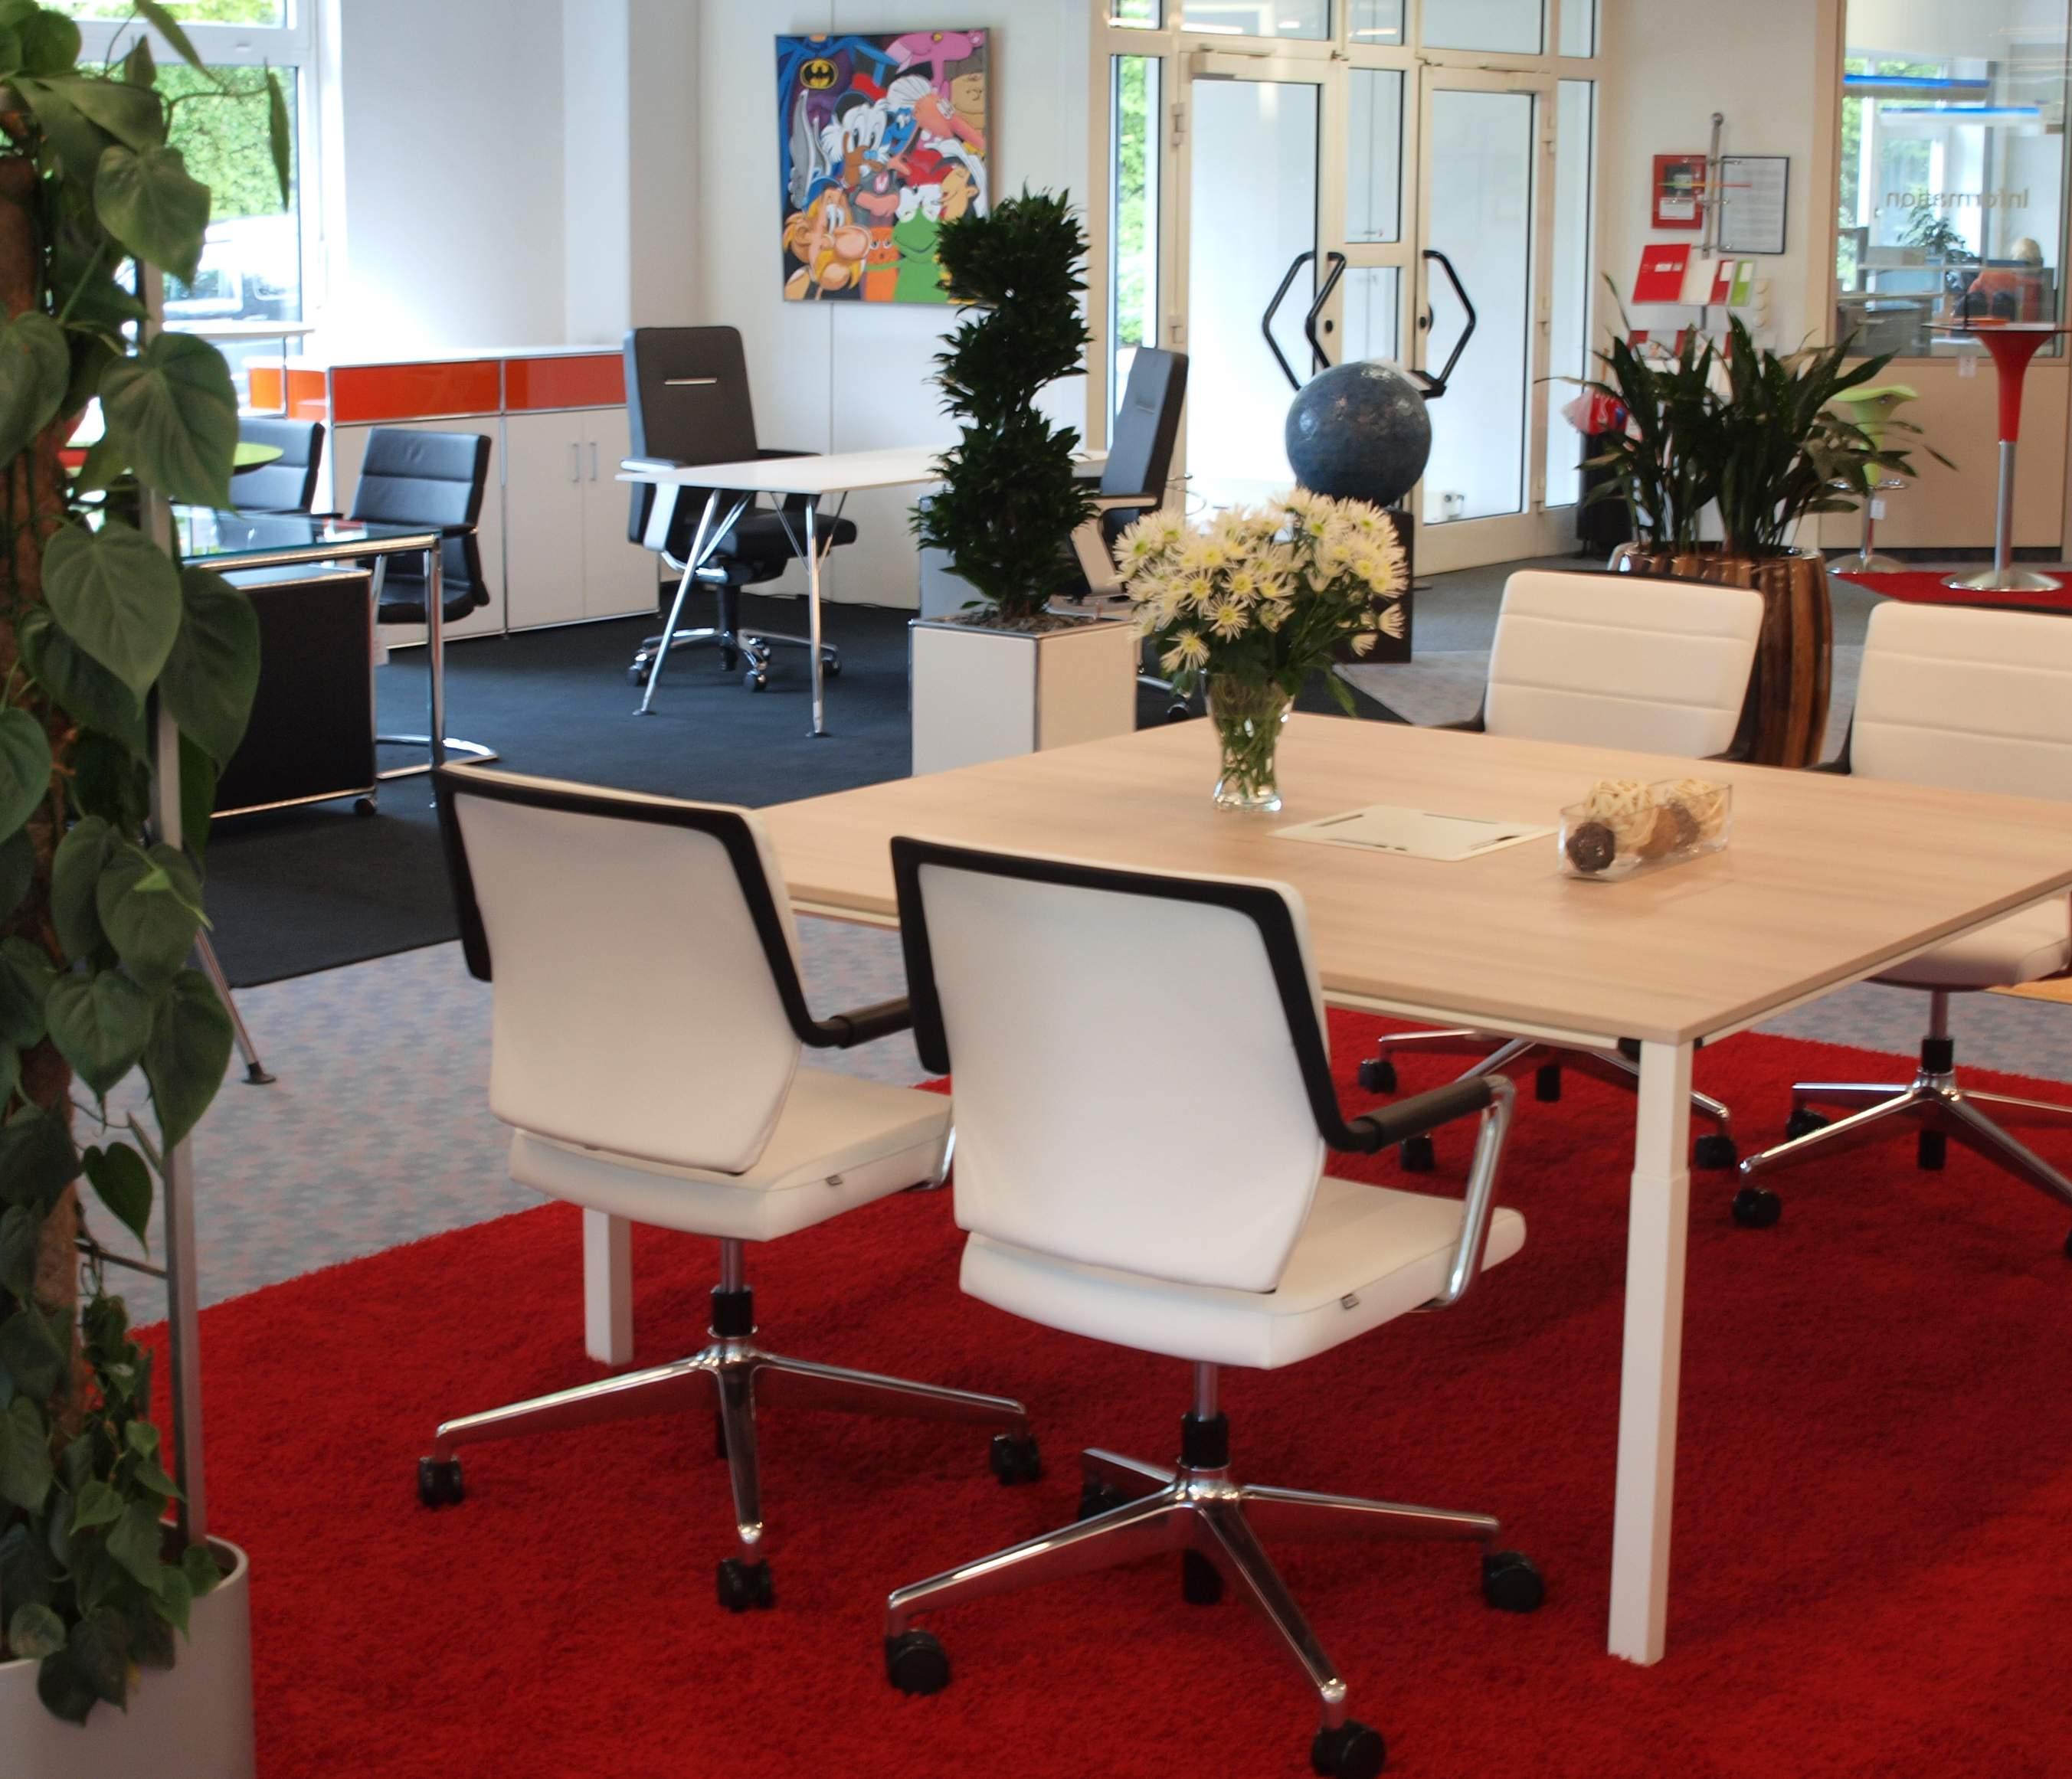 BSJ Büro Systeme Jäkel GmbH